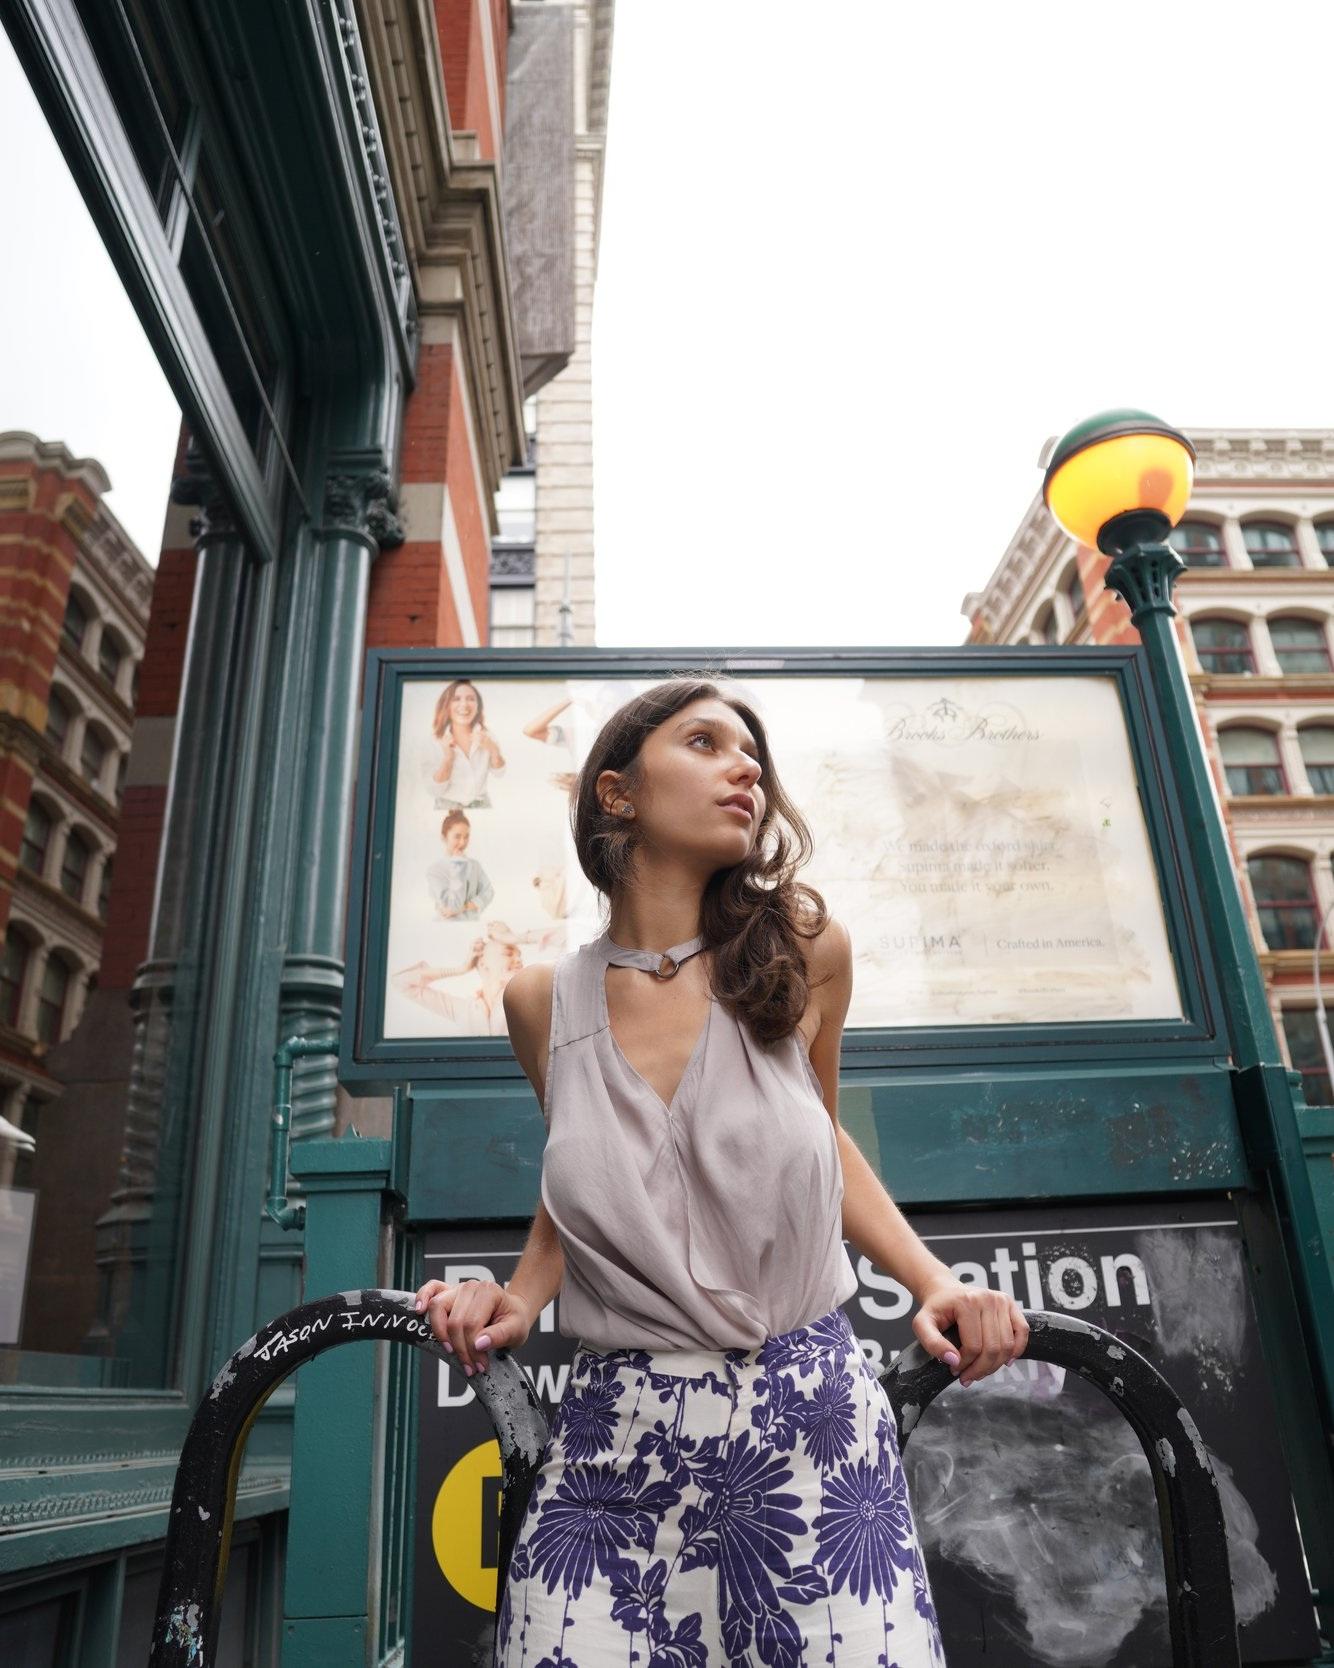 Ronald Monteron Photo - Exploring my city with photographer Ronald Monteron.